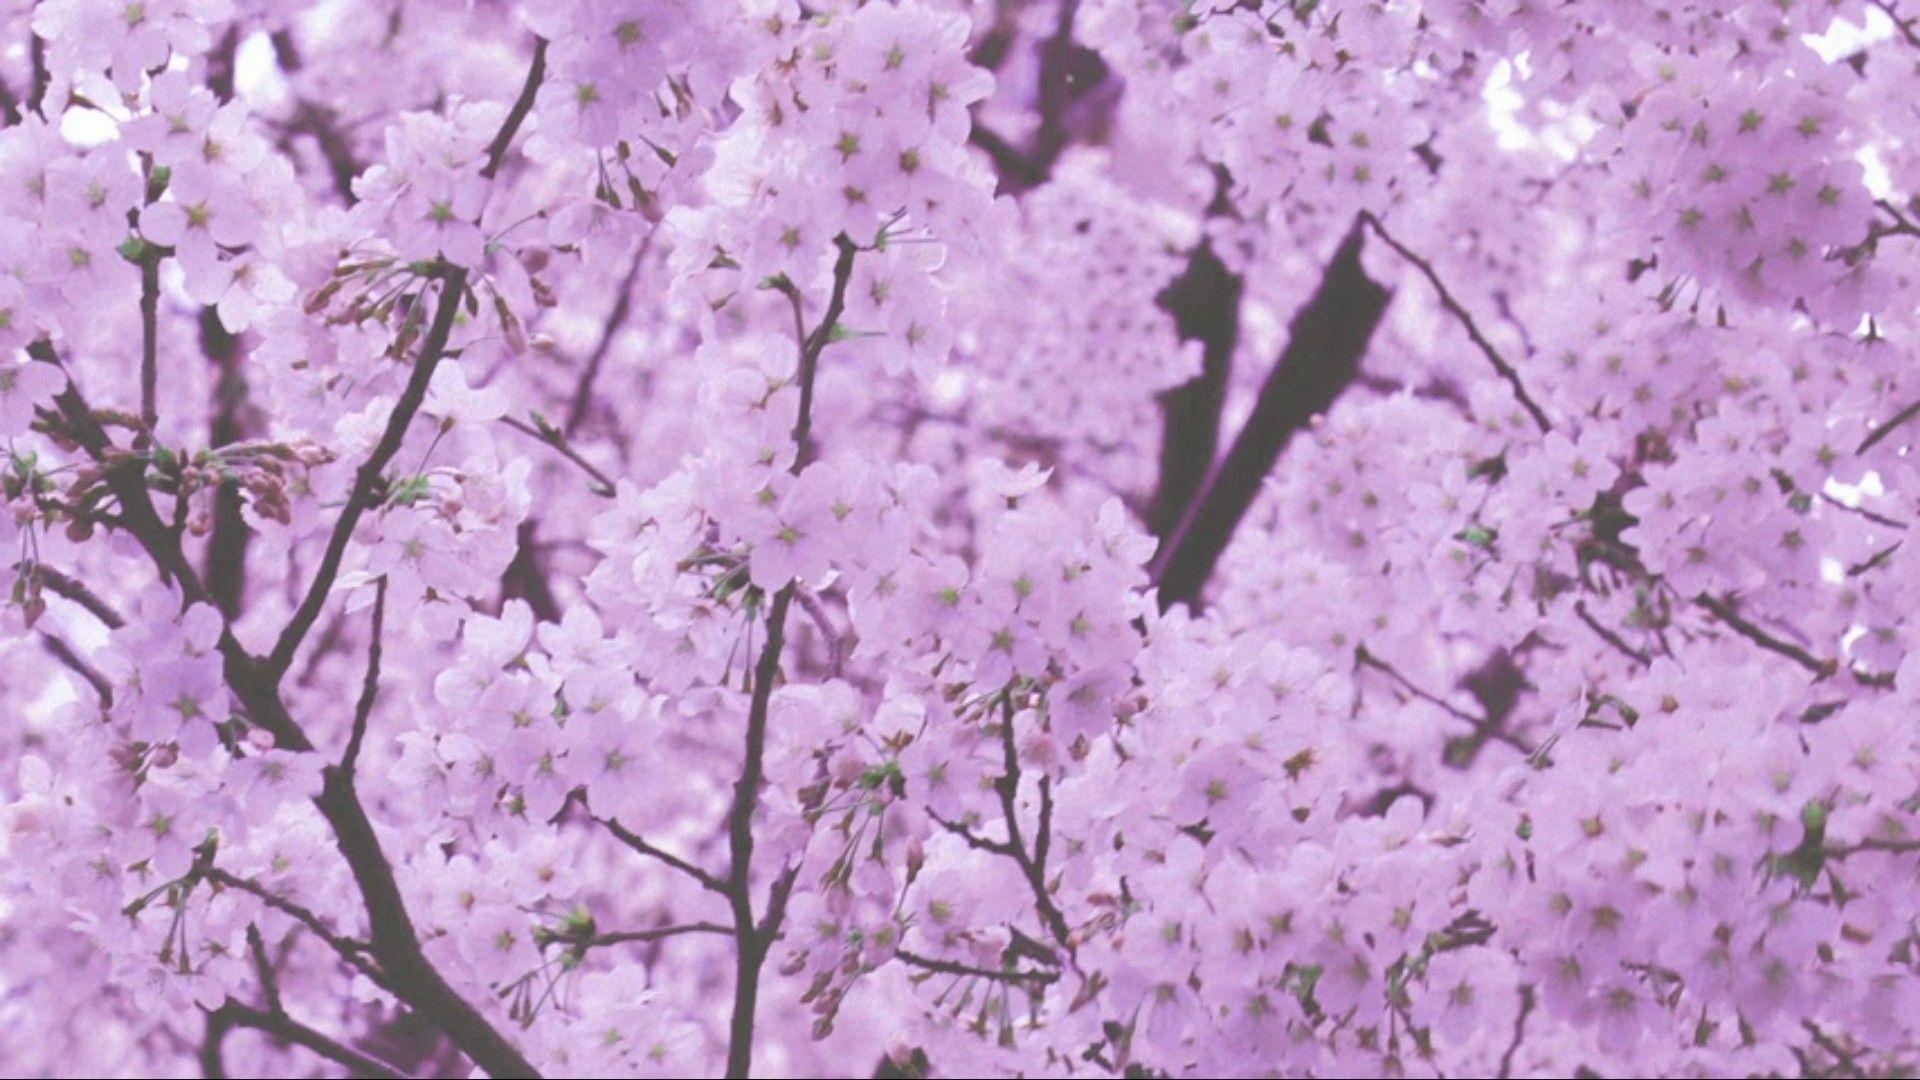 C H E R R Y B L O S S O M Cherry Blossom Wallpaper Cherry Blossom Background Cherry Blossom Japan